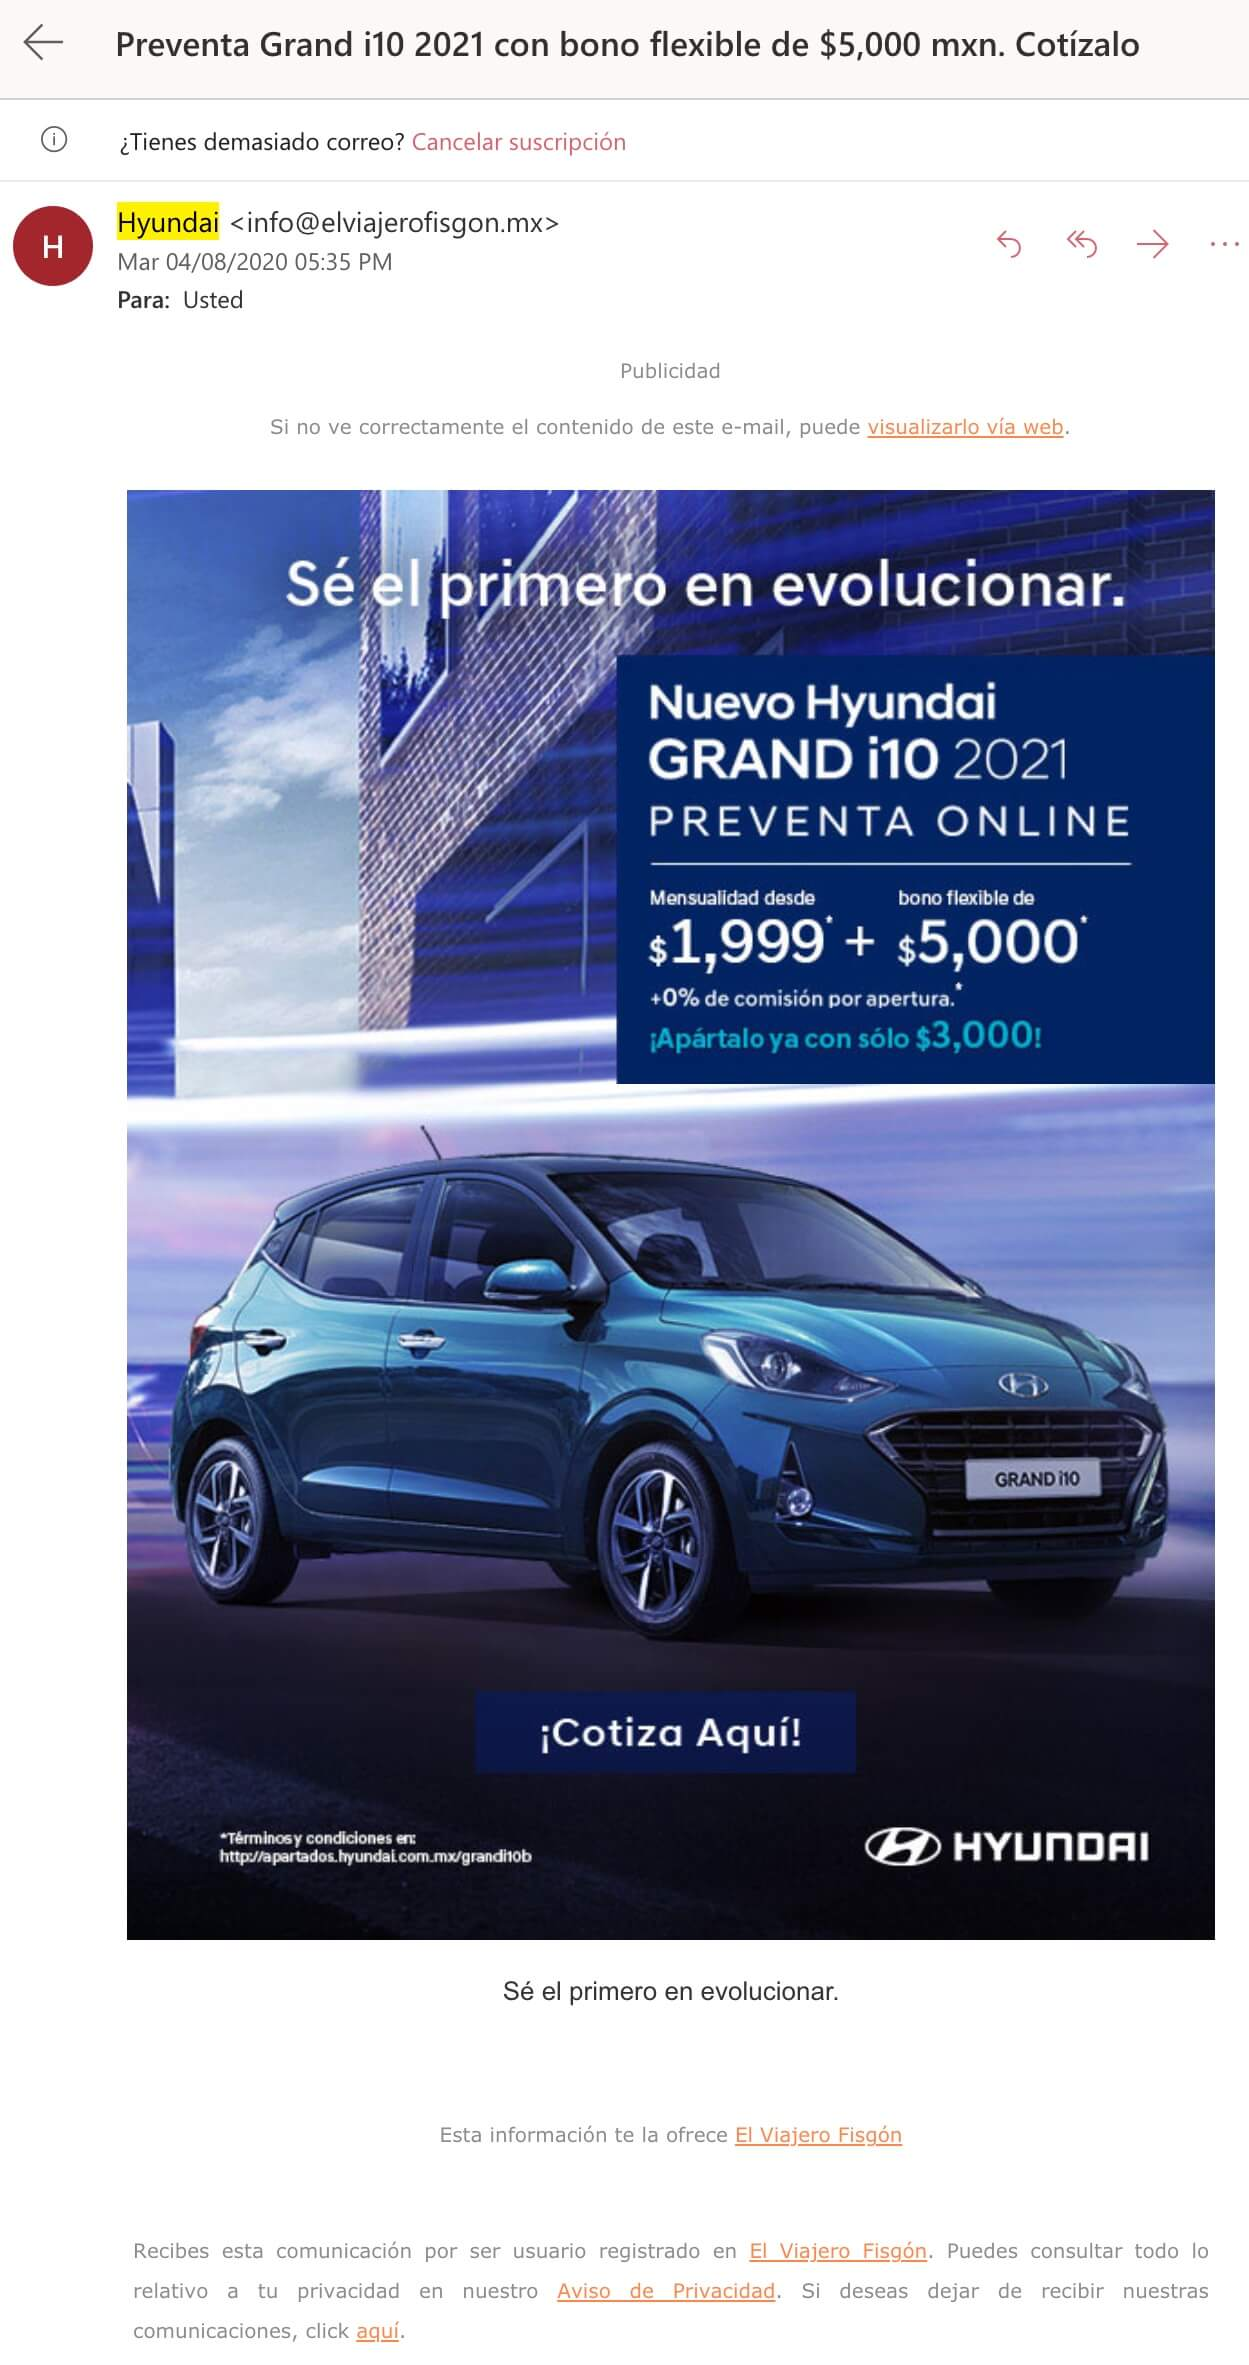 Campaña de mailing de Hyundai